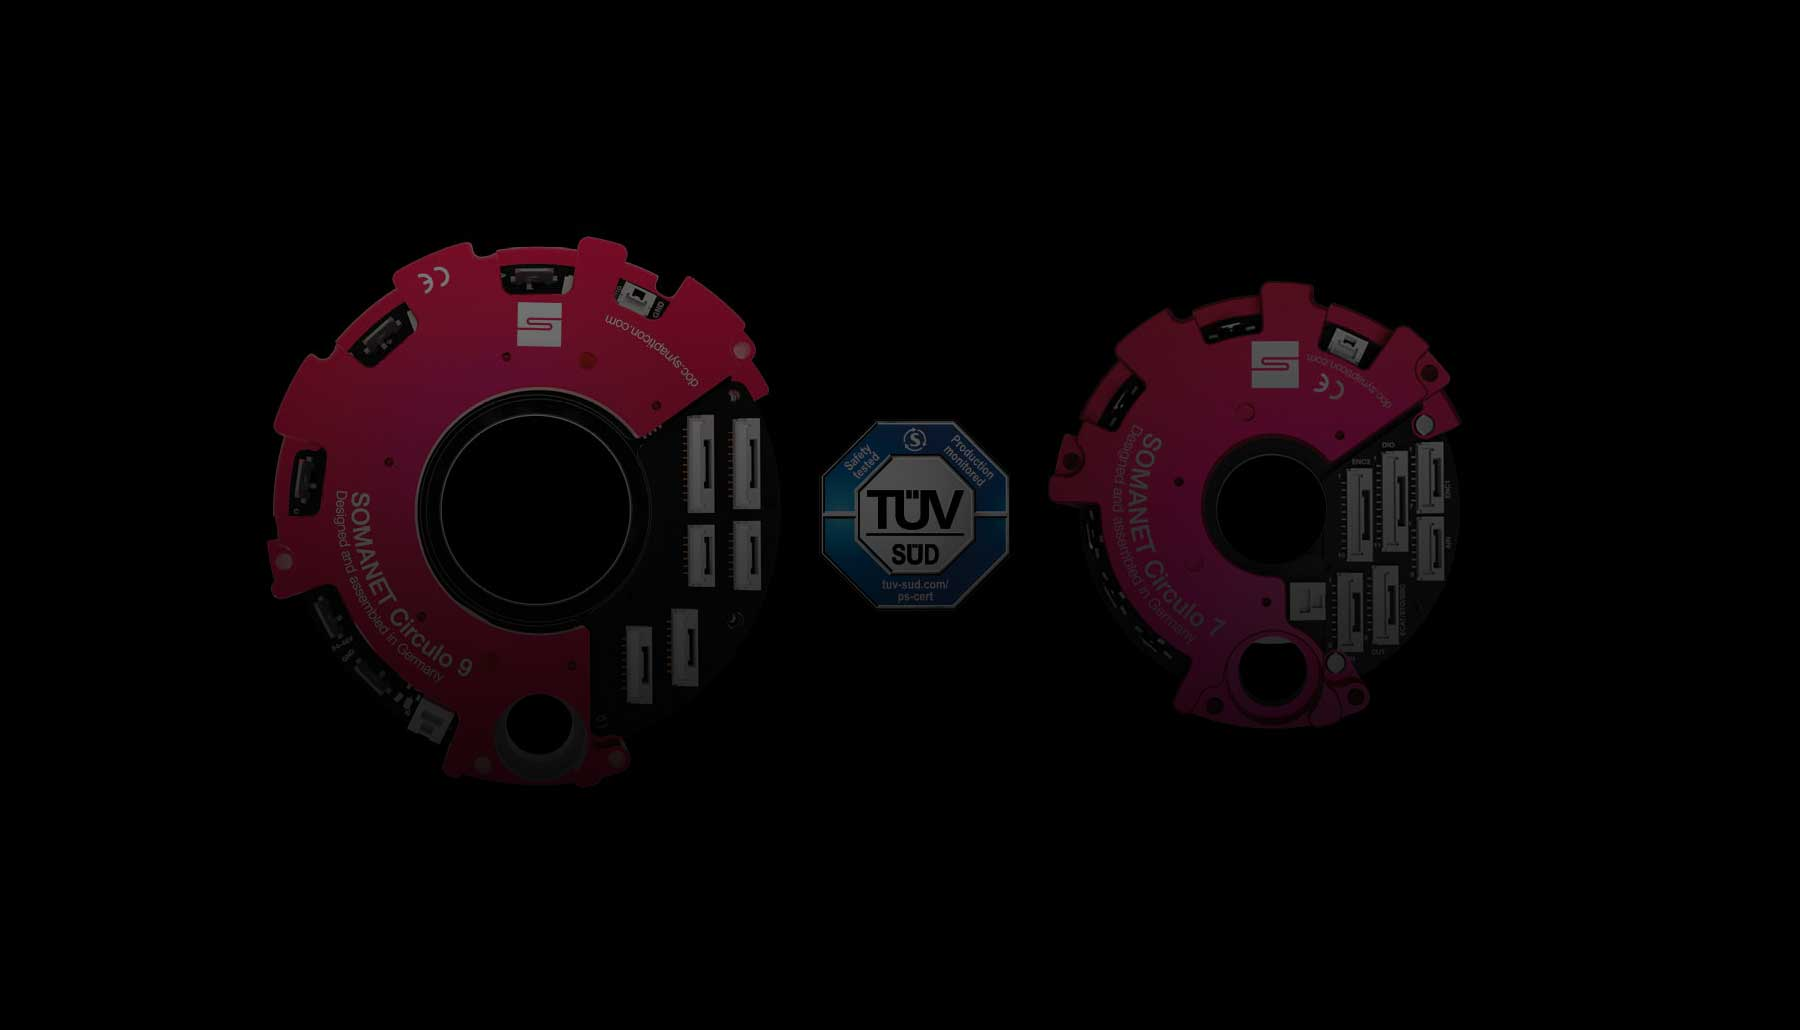 Synapticon circulo sizes TUEV verlauf